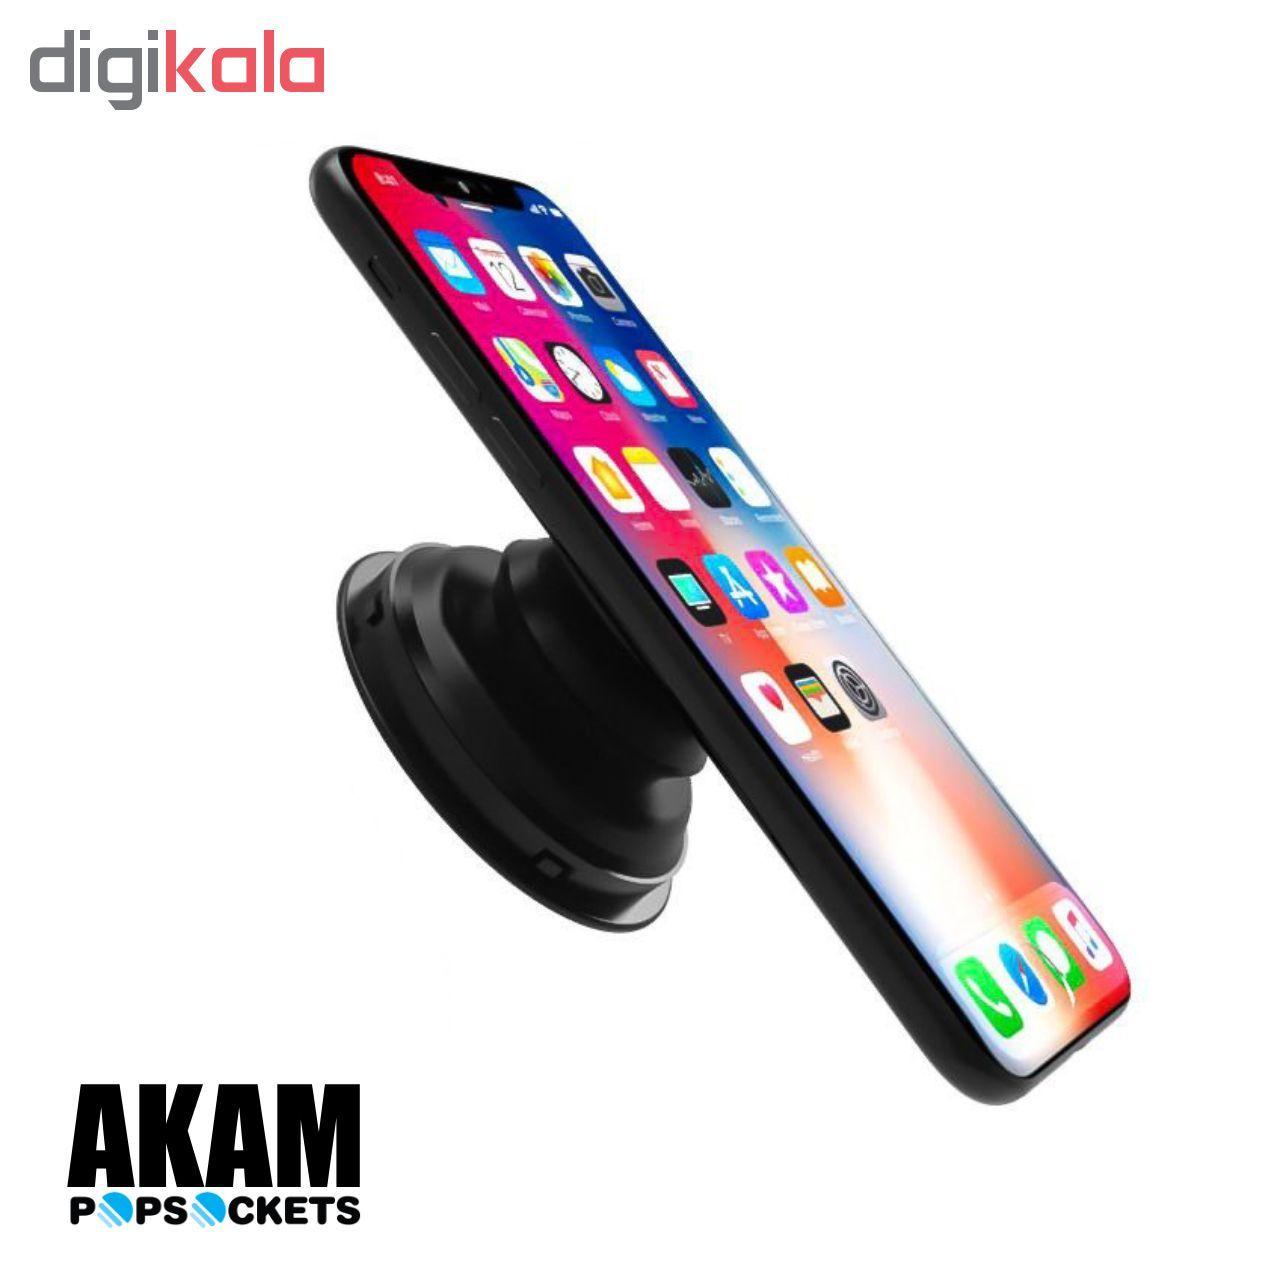 پایه نگهدارنده گوشی موبایل پاپ سوکت آکام مدل APS0107 main 1 7